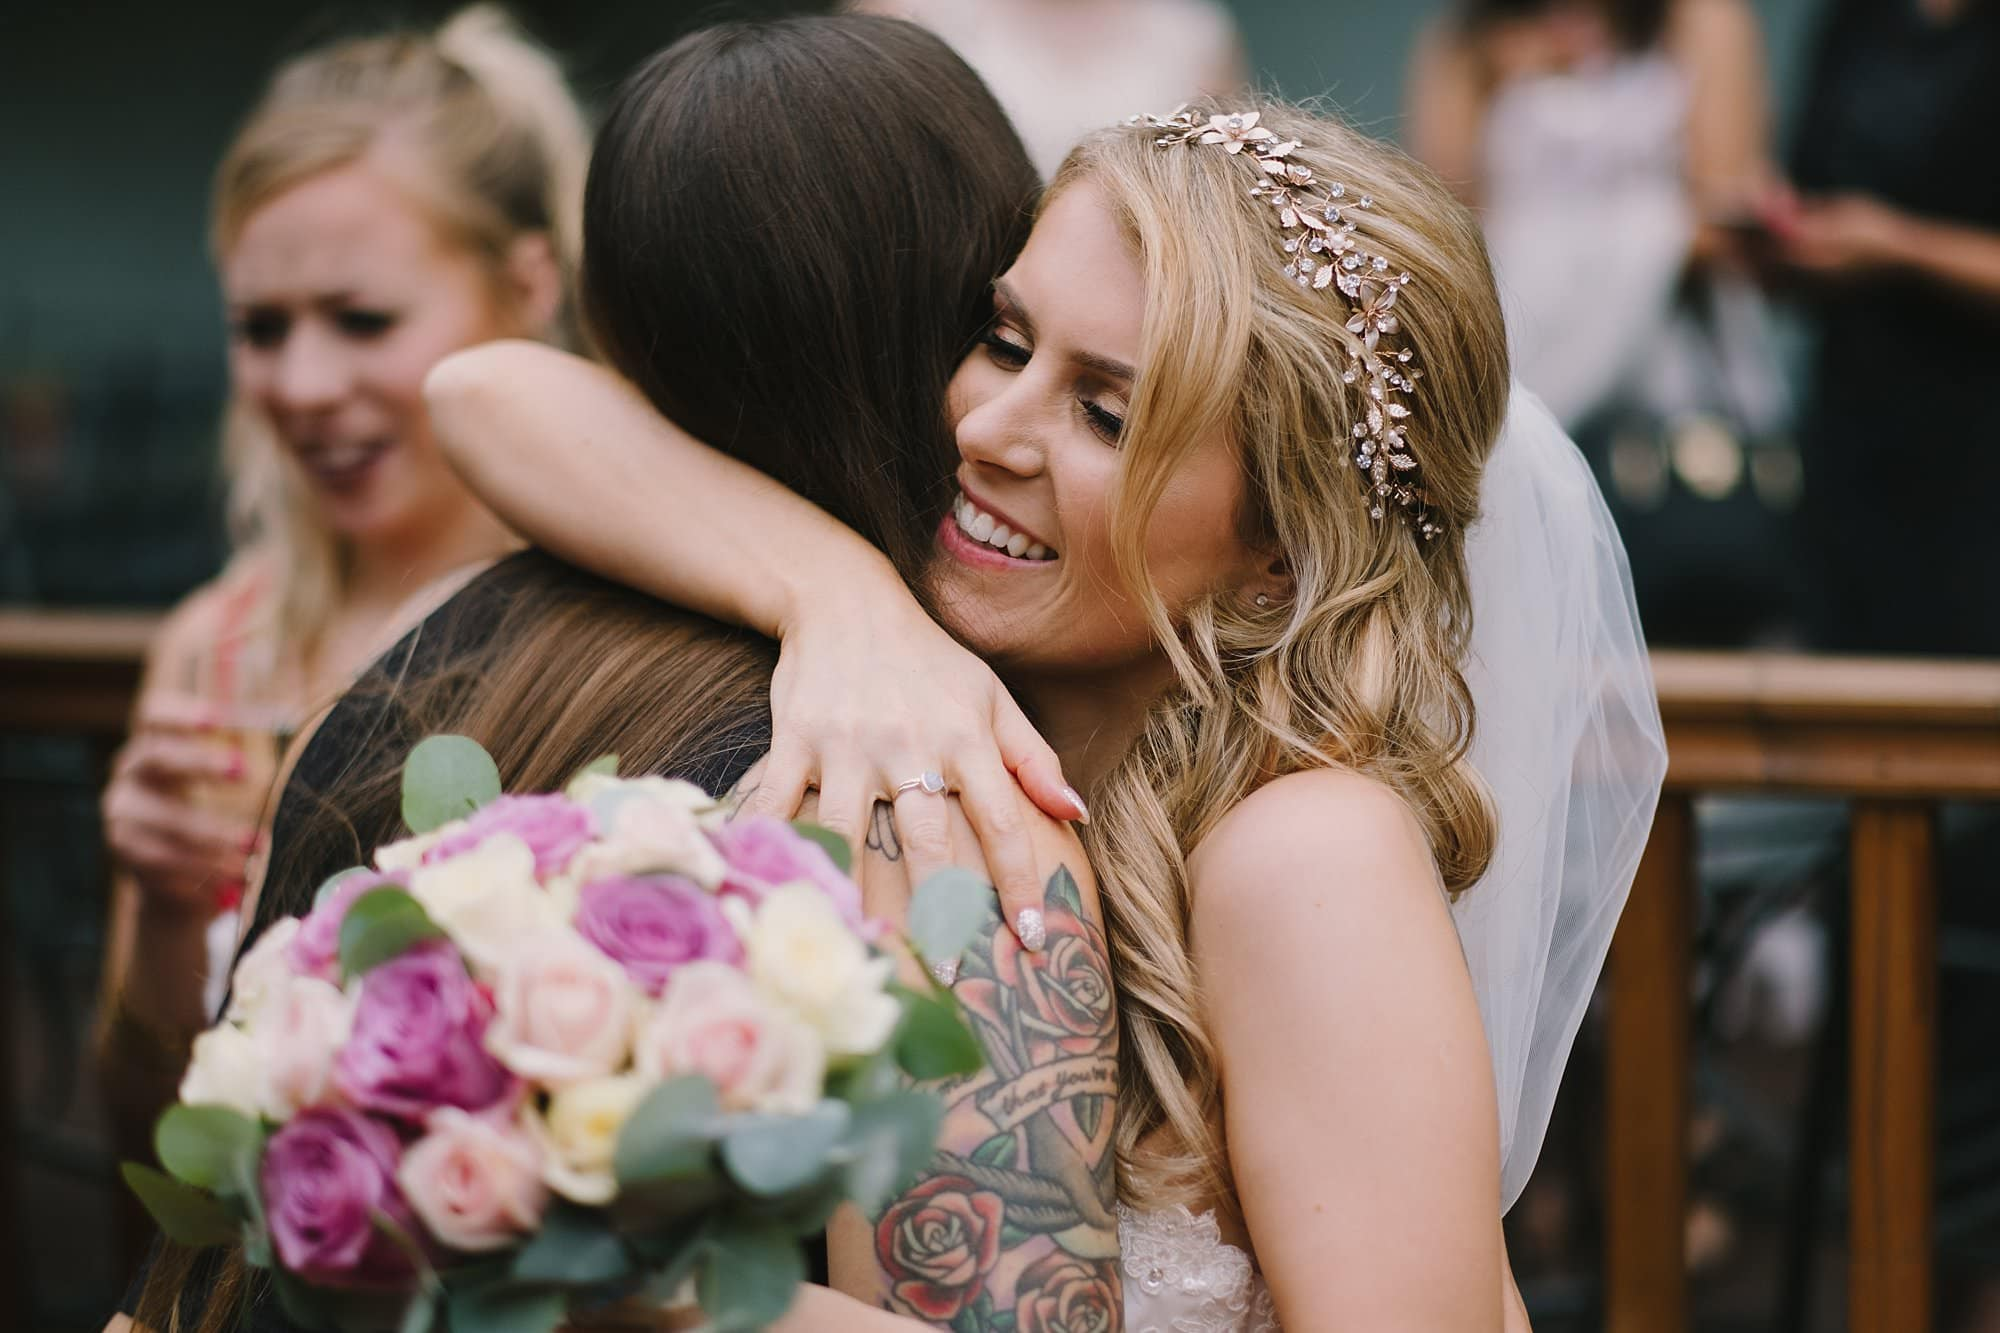 london pub wedding photographer jn 017 - The County Arms Wedding Photographer   Jen & Nick